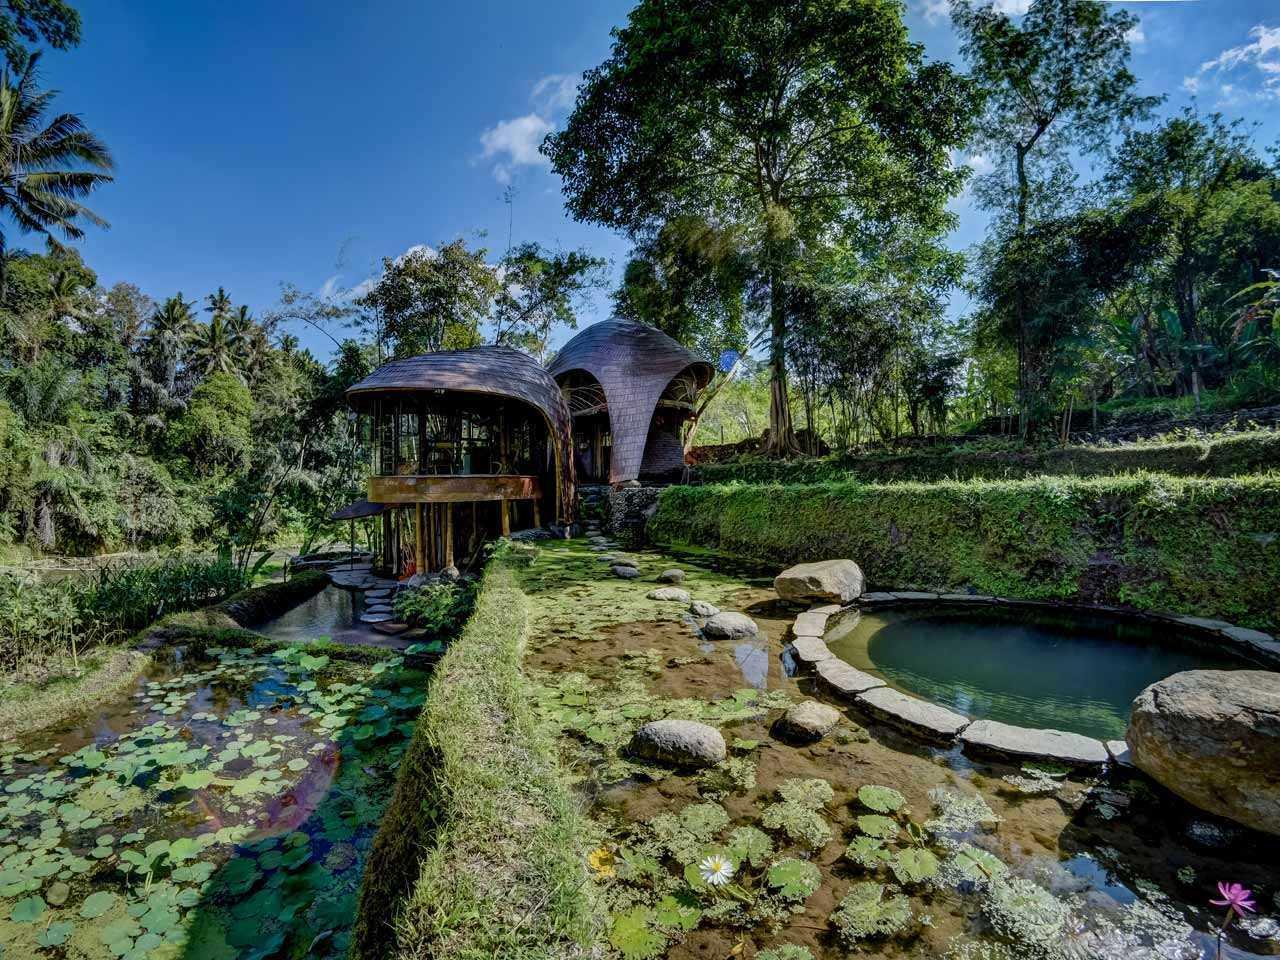 Agung Budi Raharsa | Architecture & Engineering Riverbend Bamboo House - Bali Bali, Indonesia Bali, Indonesia Exterior View Tropical 88700